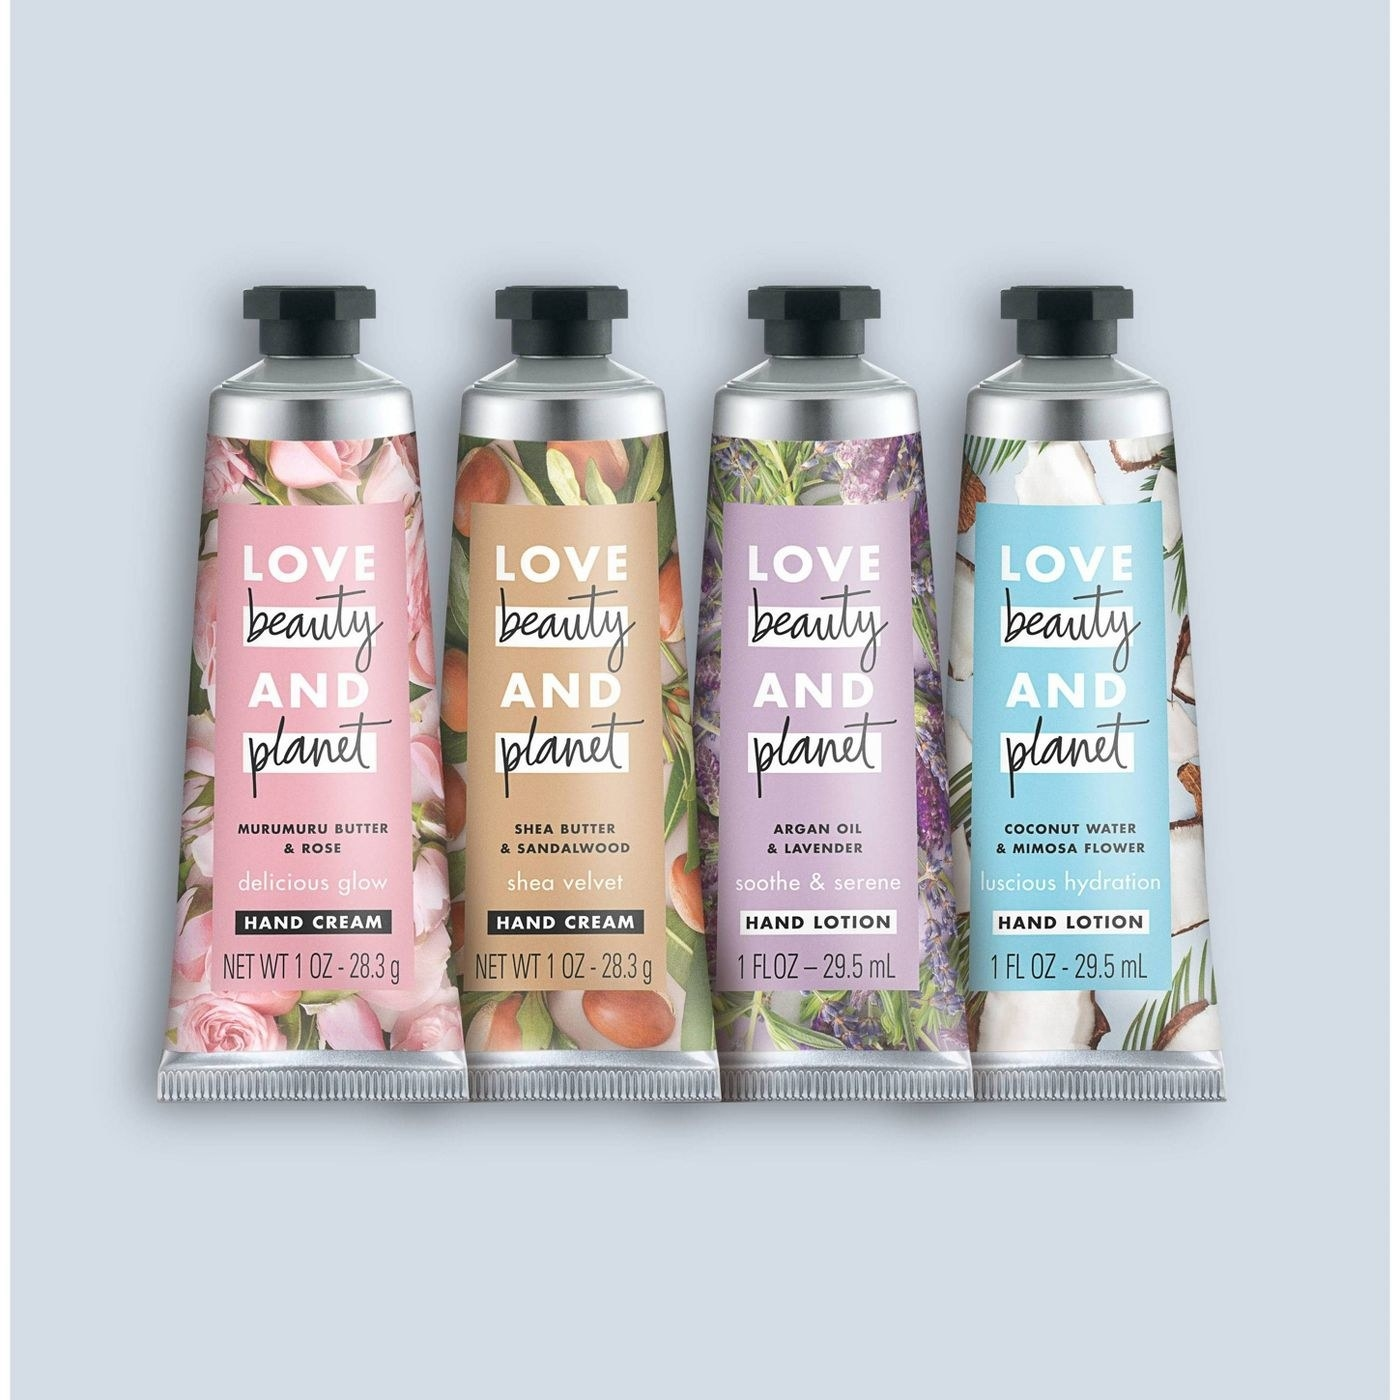 Four tubes of hand cream